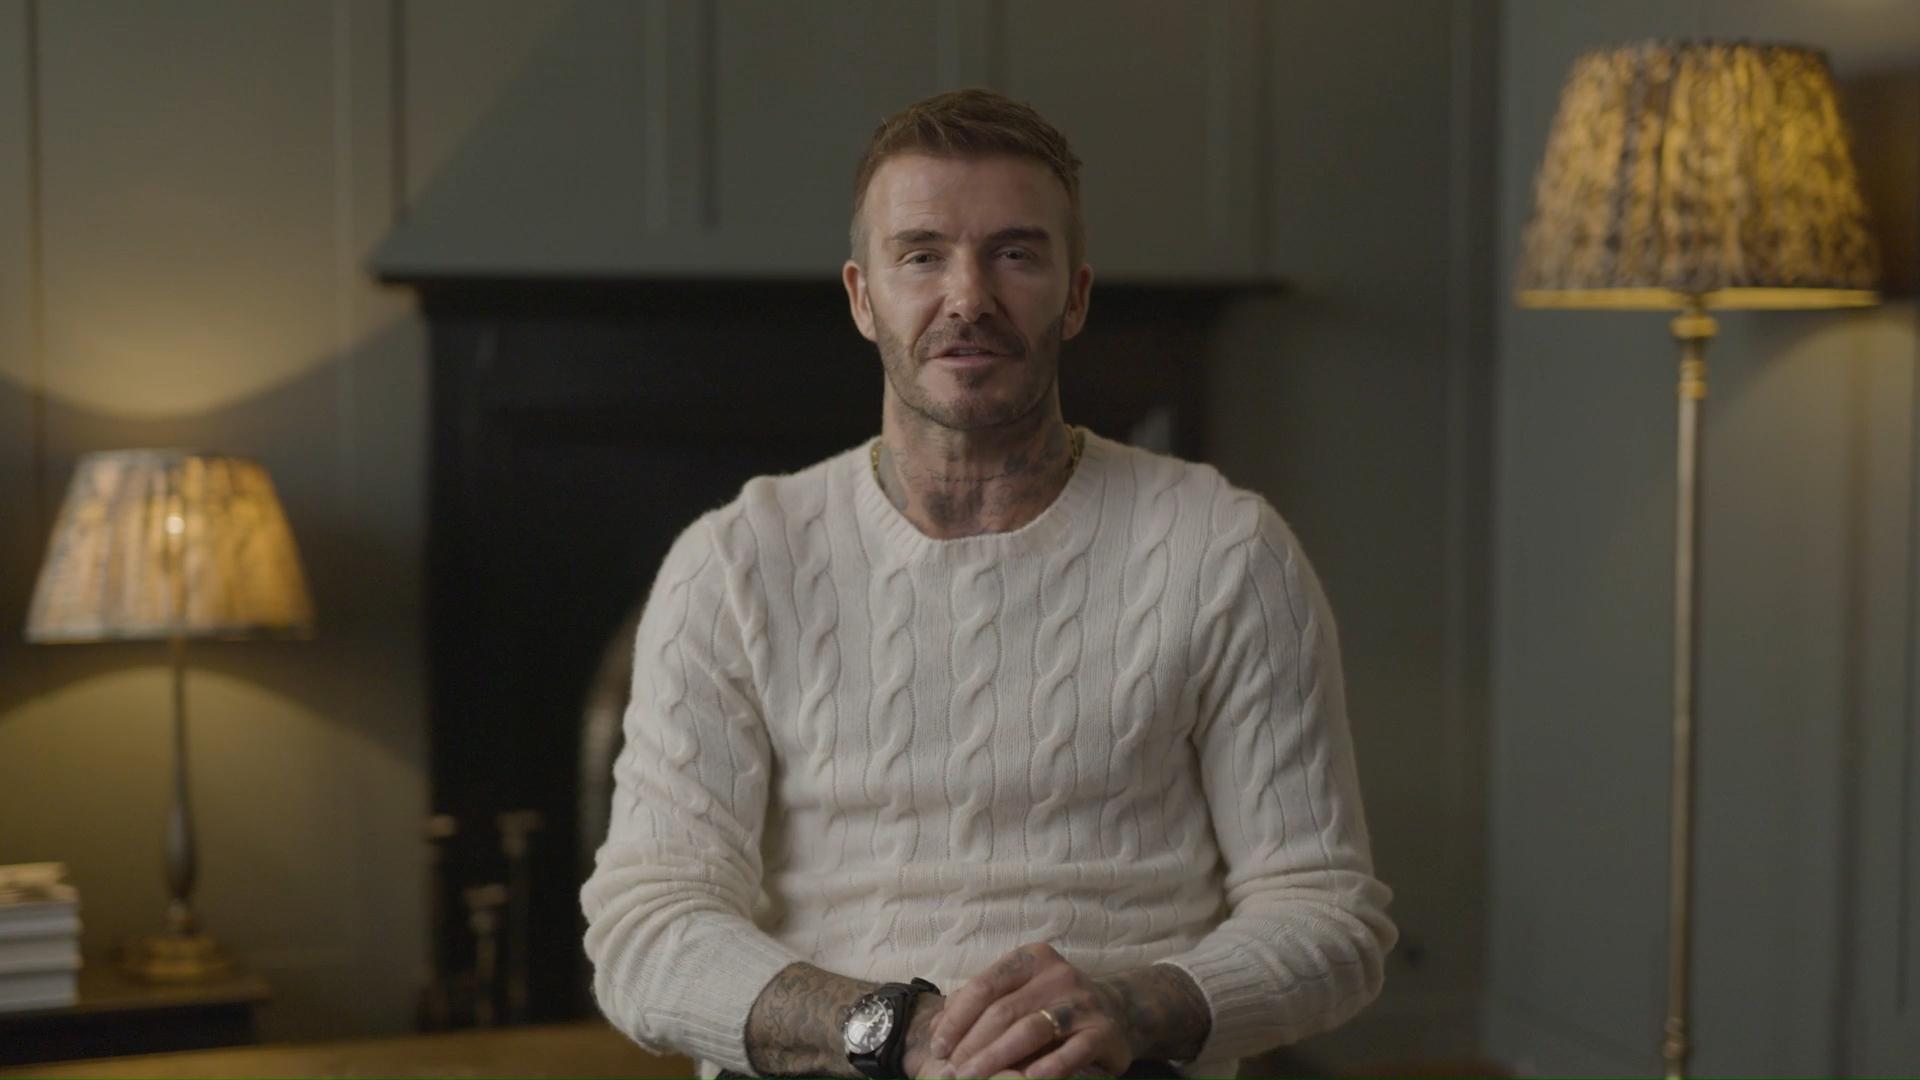 David Beckham supports Relief Run